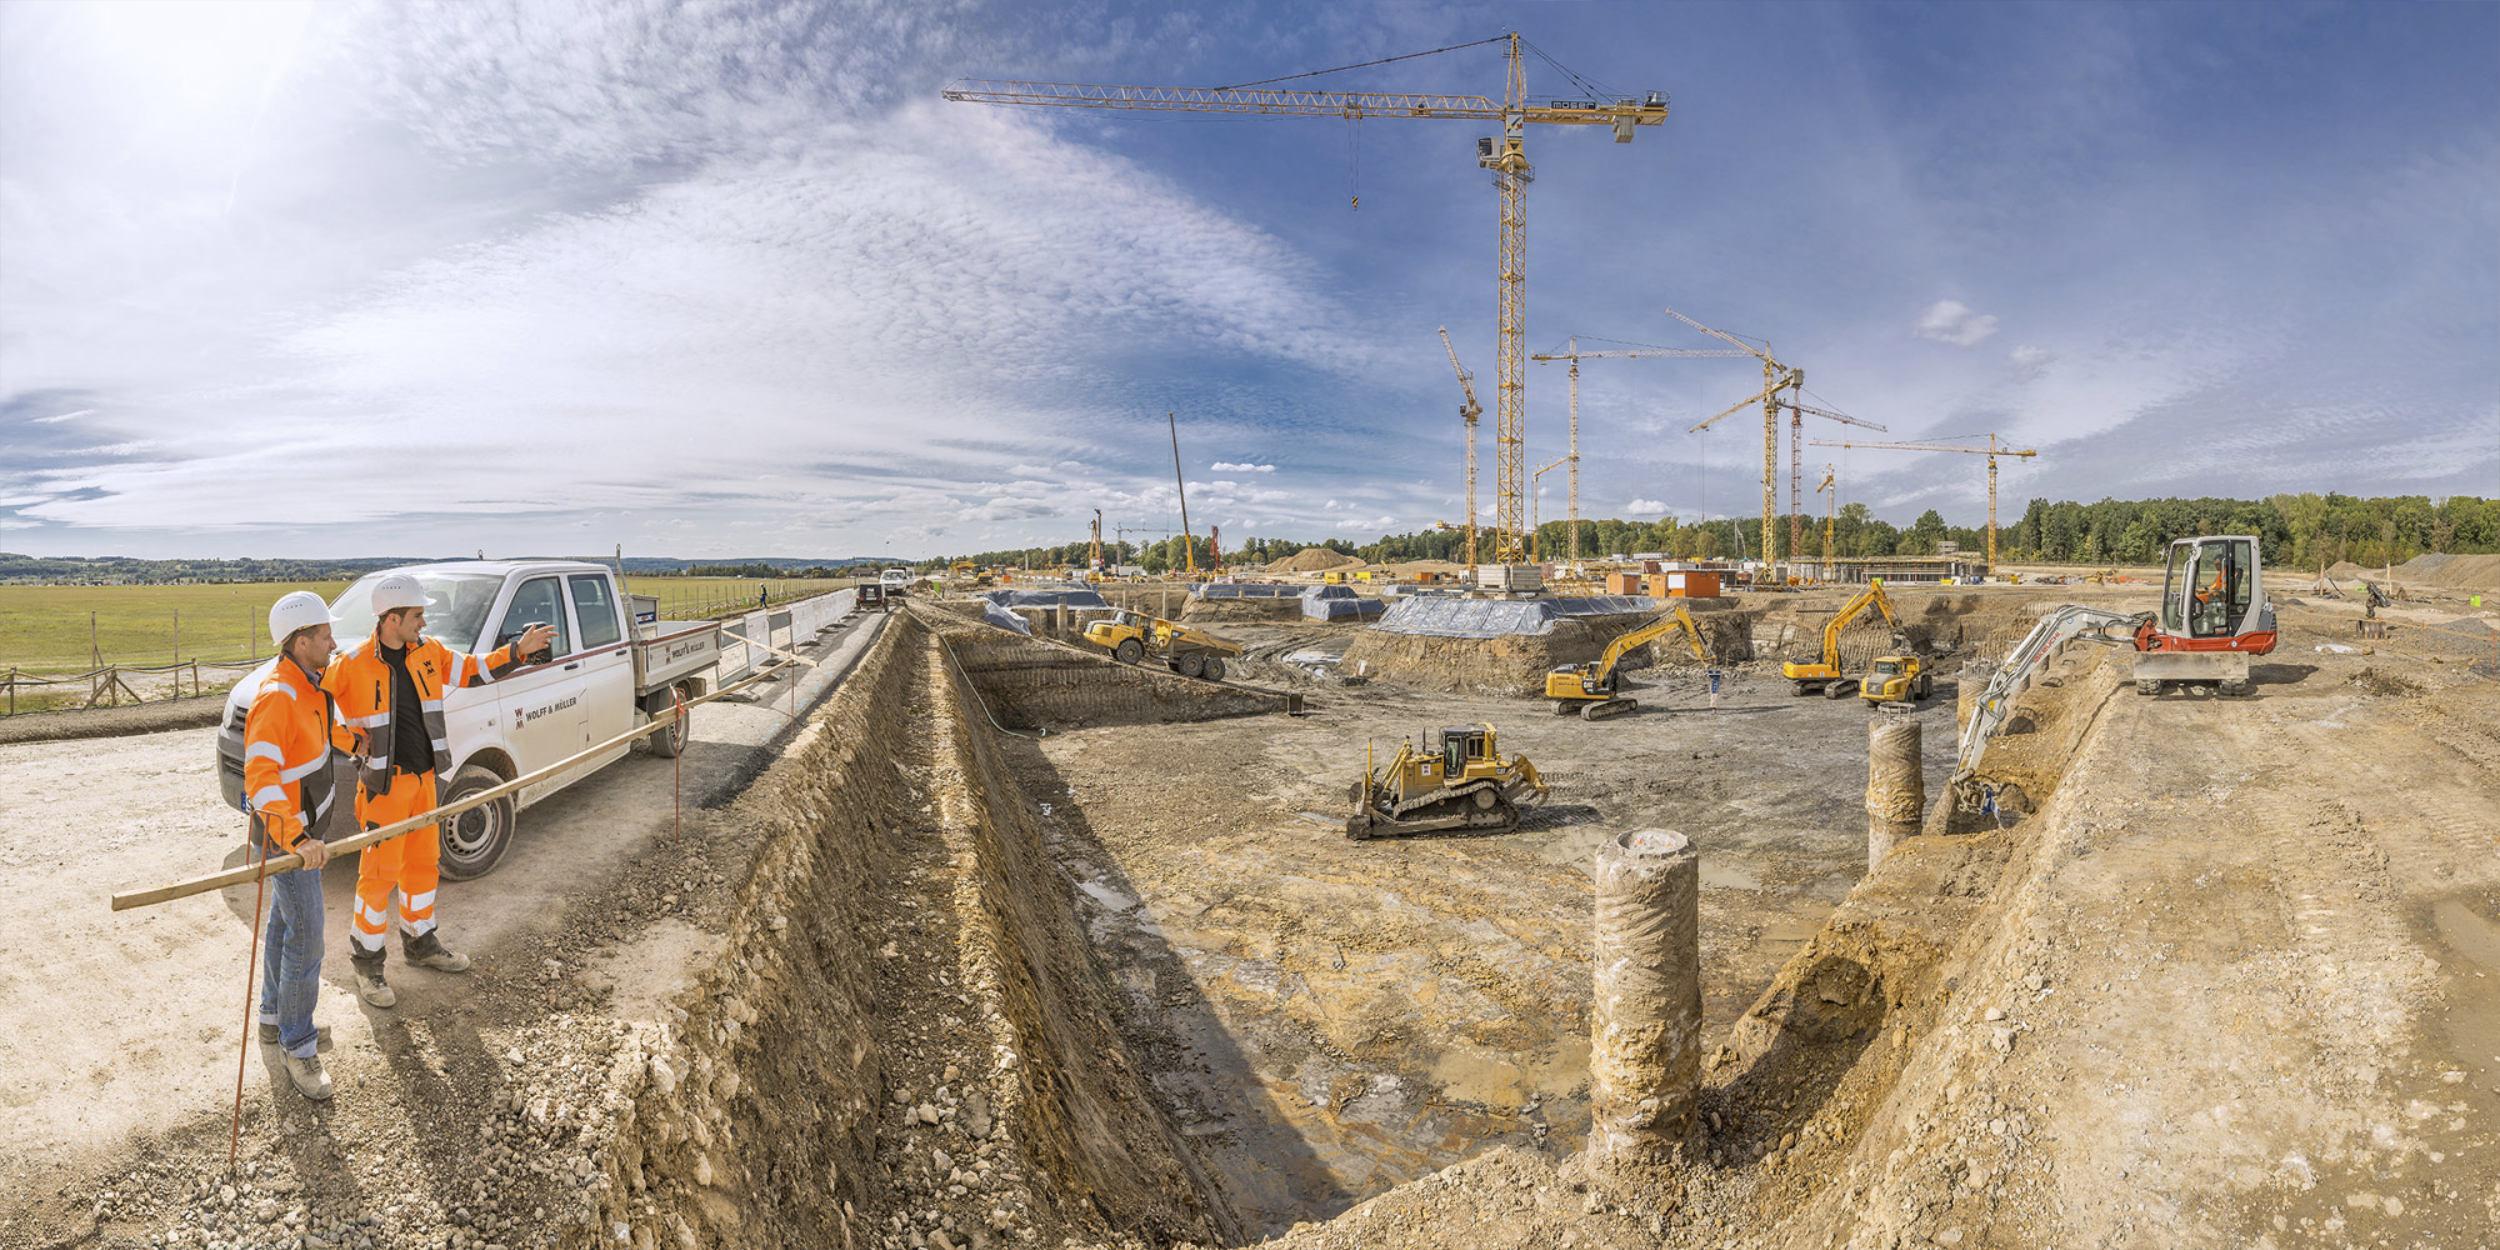 Panoramafotografie Virtuelle Touren 360Grad Fotografie Stuttgart und Umgebung Wolff und Müller Bauarbeiten Tiefbau Malmsheim Besprechung Baubegutachtung Bagger Kräne Kipper